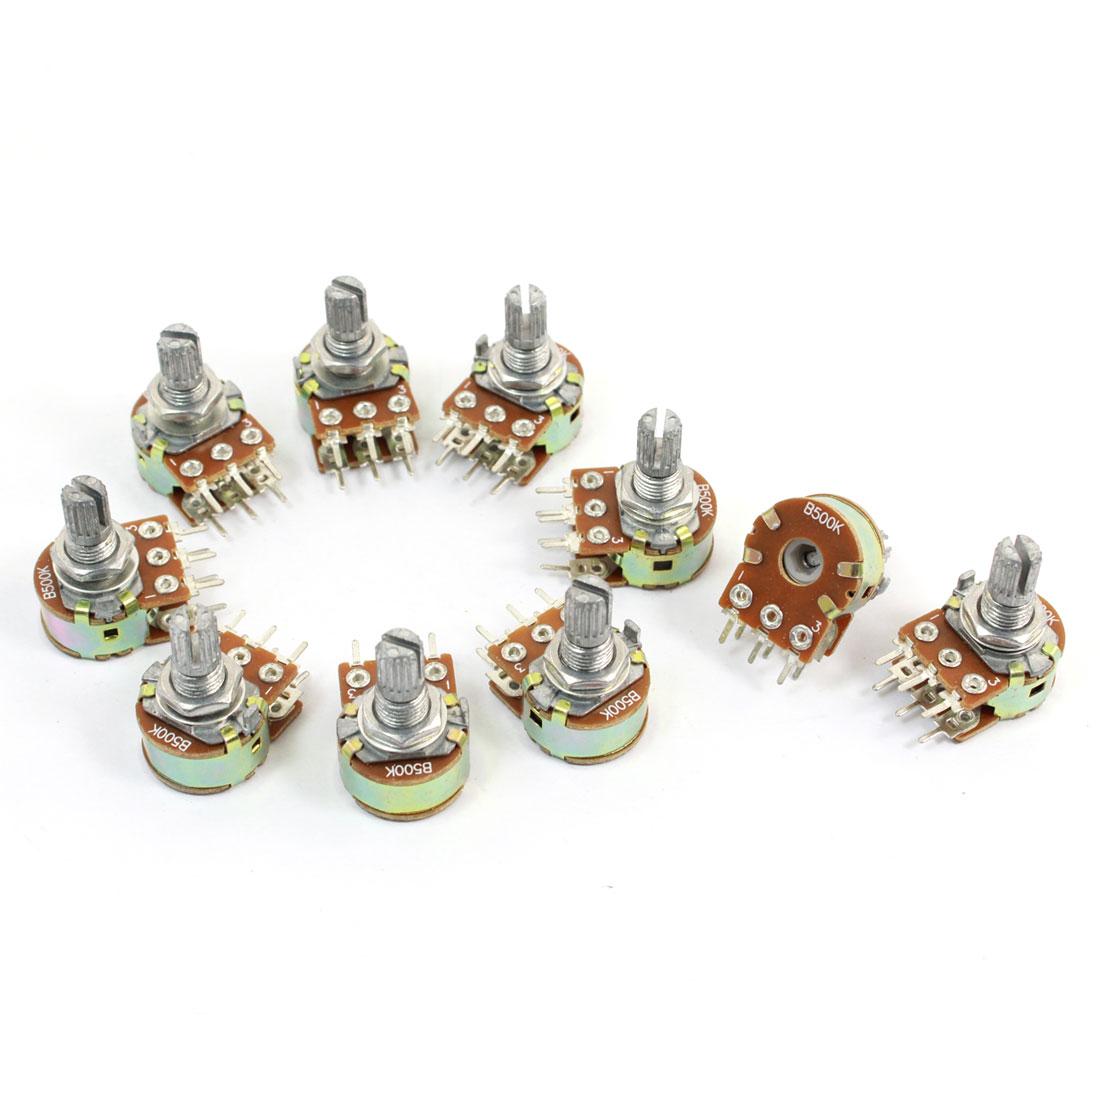 10 Pcs 500K Ohm Knurled Shaft Adjust Top Dual Linear Potentiometers AC 250V